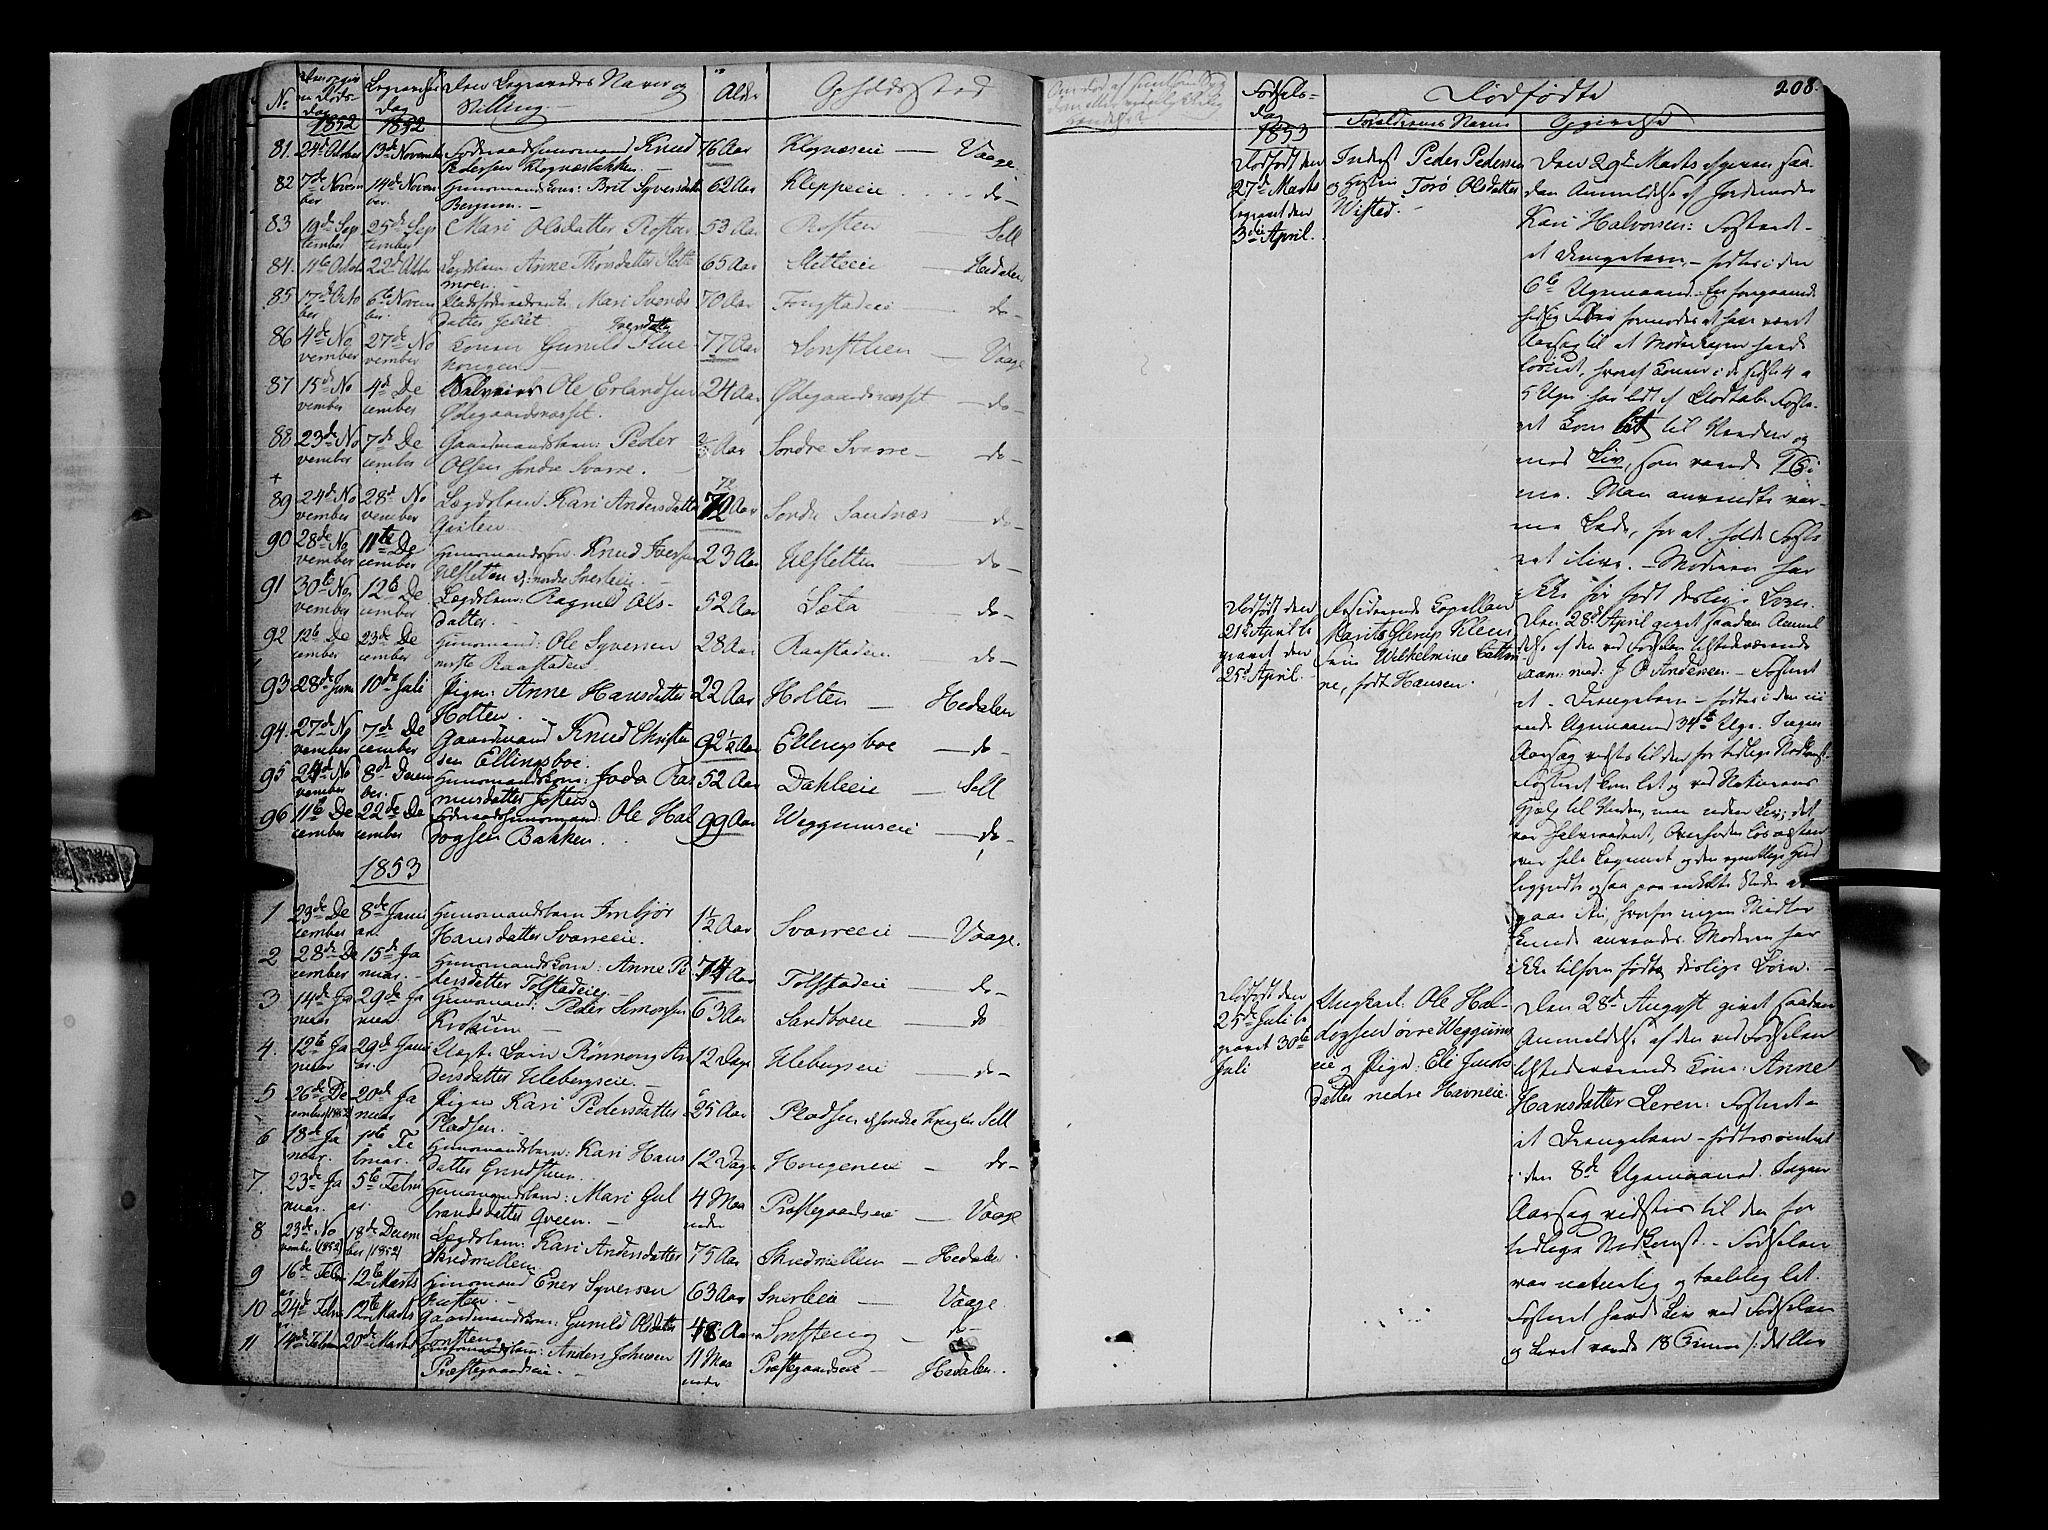 SAH, Vågå prestekontor, Ministerialbok nr. 5 /1, 1842-1856, s. 208